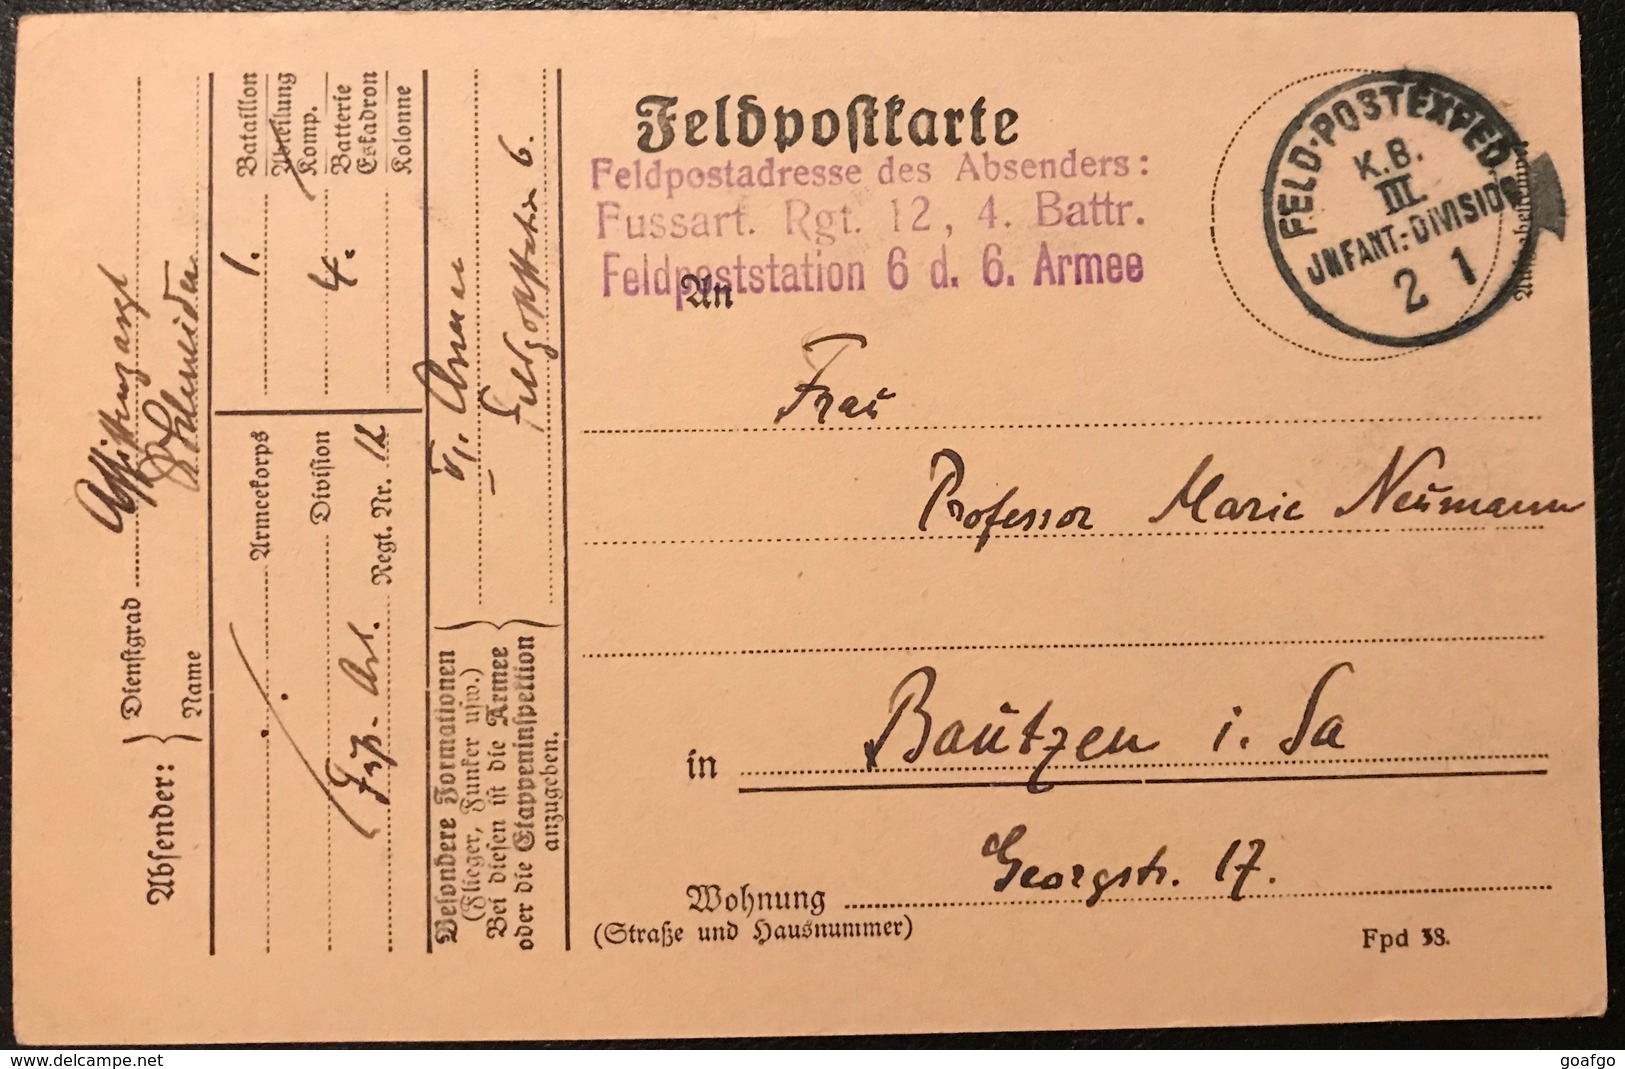 Alte Feldpostkarte Aus Dem Jahr 1915 Regiment 12 , 4. Battr. Station 6. Armee - Documents Historiques